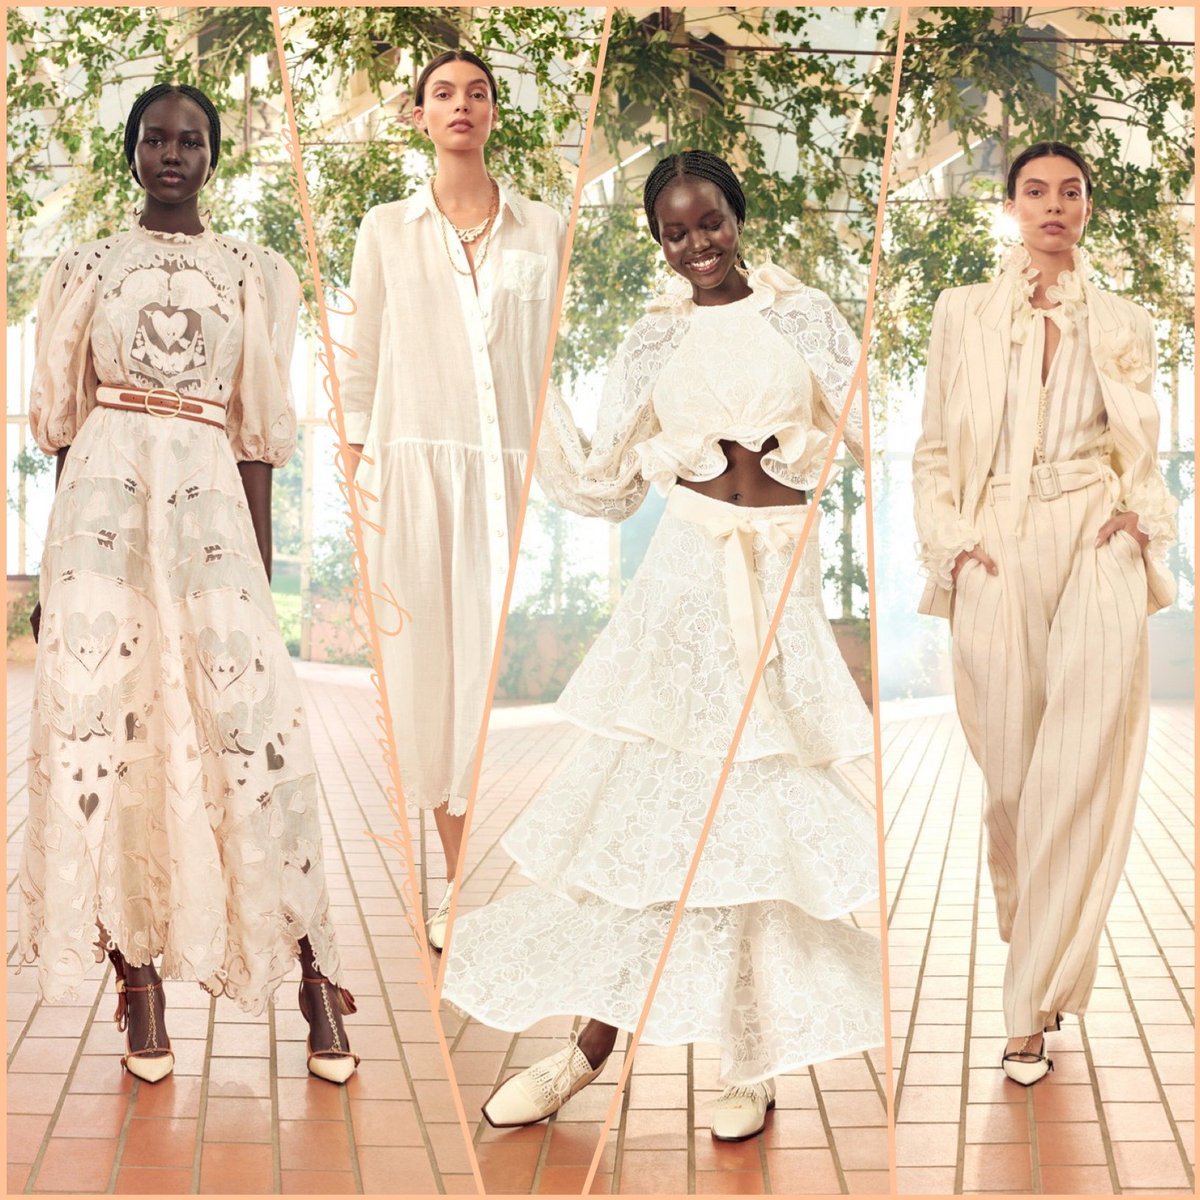 Lovestruck #Zimmermann RS21  CHECKED!  #celebrity #checked #chic #designer #fabulous #fashion #fashionblog #fashionblogger #fashionforward #gorgeous #ootd #redcarpet #RS21 #runway #style #stylist #trend #trending #vogue #werk #womenswear https://t.co/gFxtc56k8U https://t.co/B2HXVY4Dzs